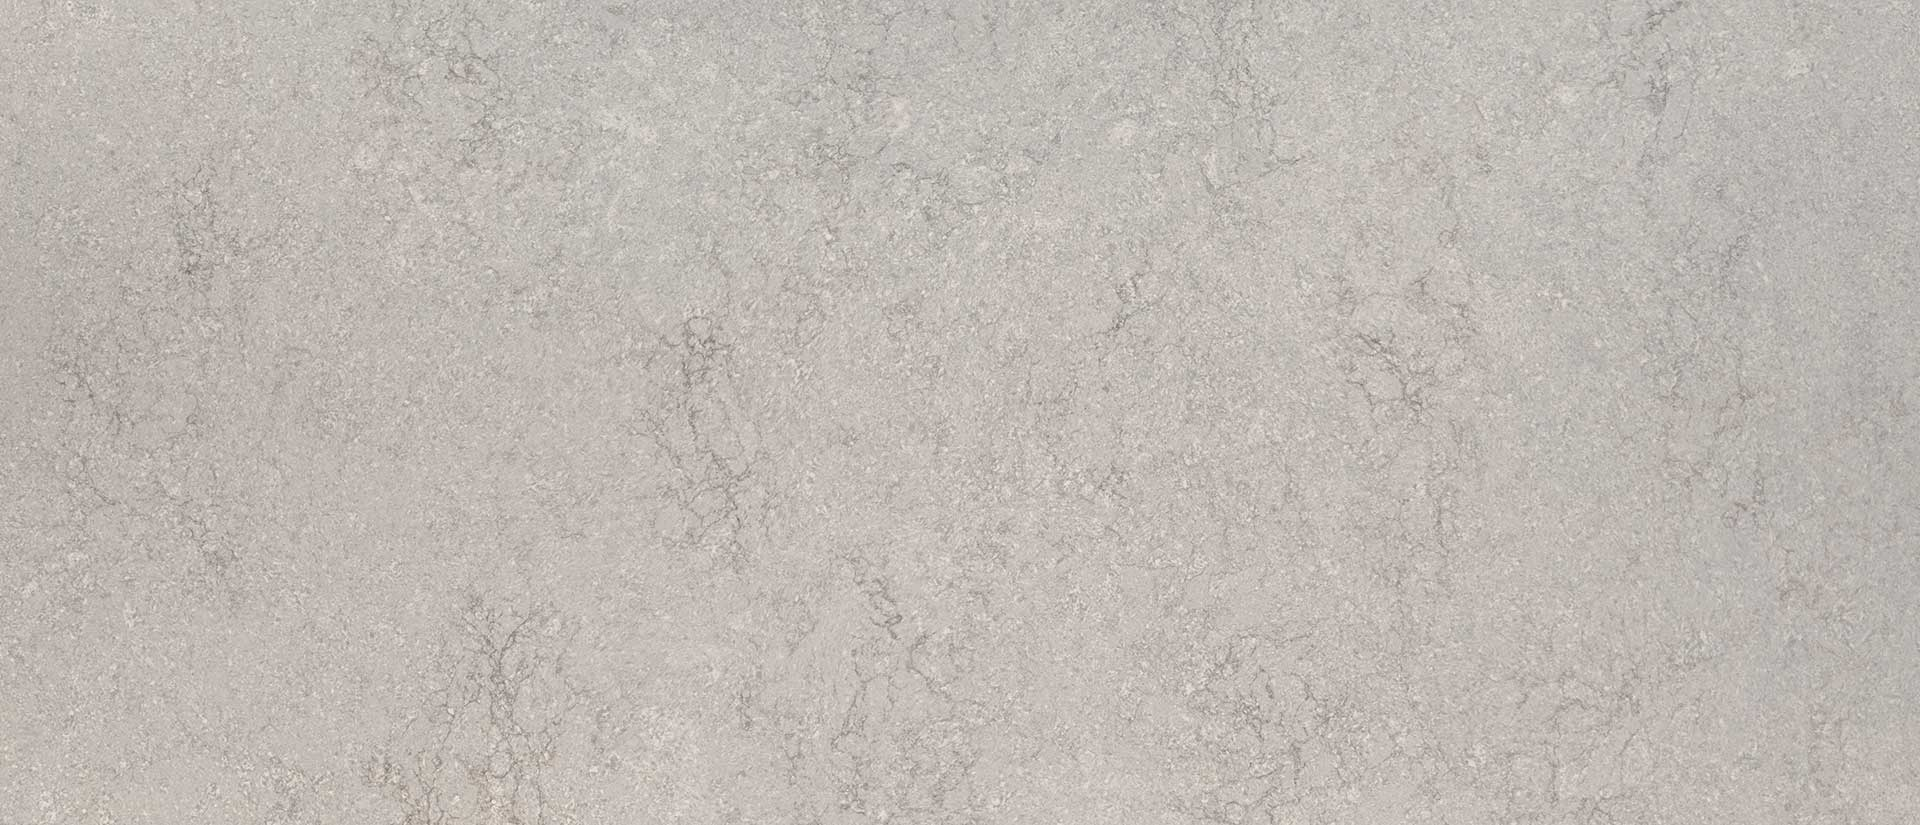 Quartz Countertops That Look Like Concrete 1500 Trend